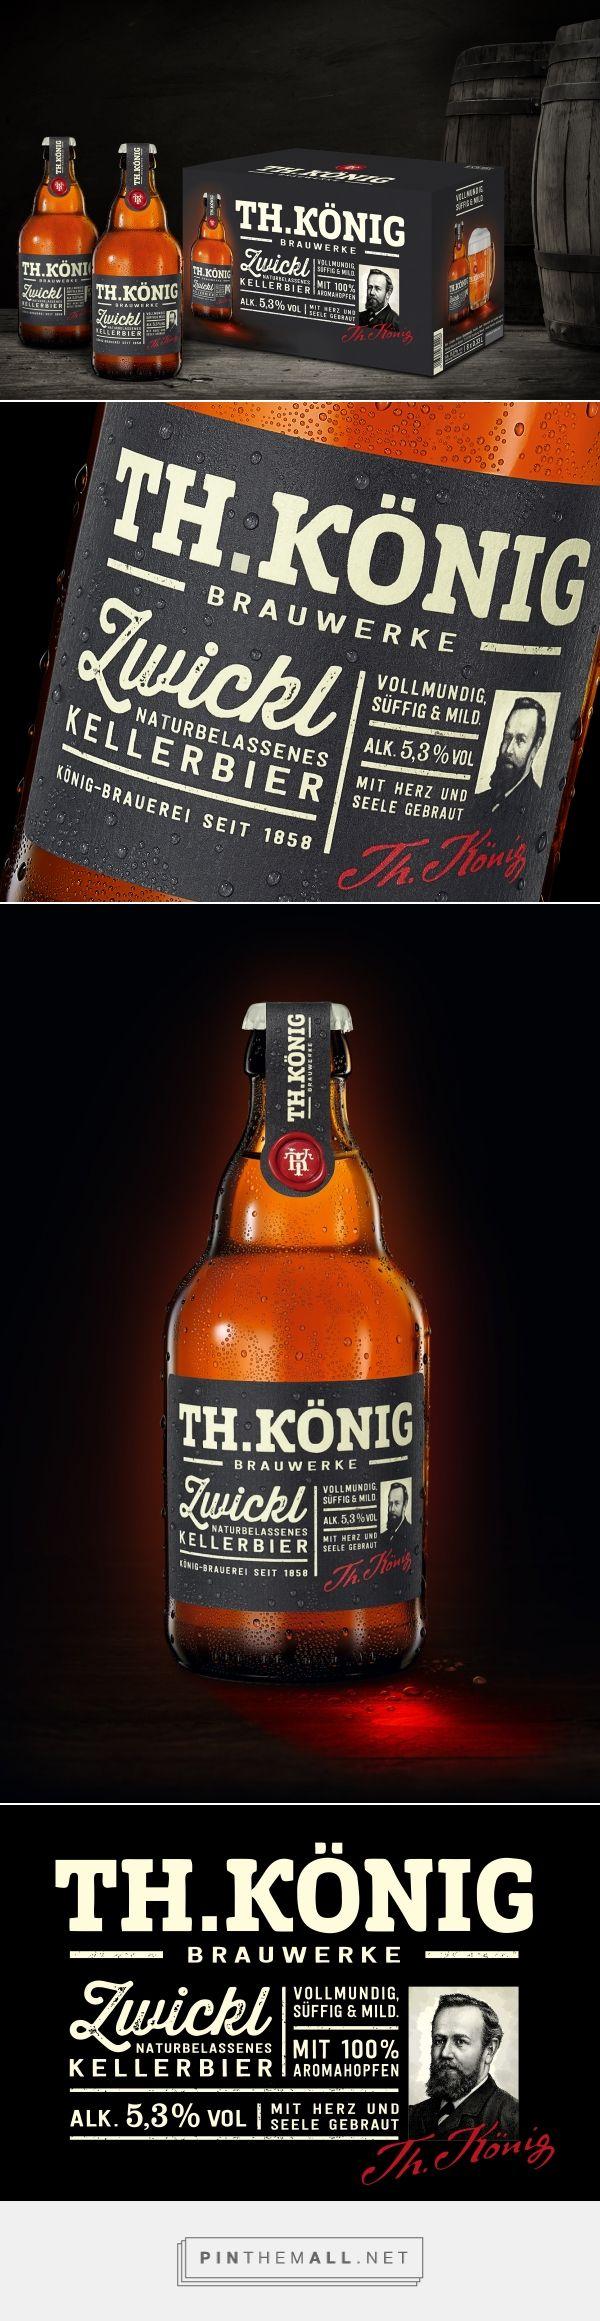 Th. Koenig Specialty Beer - Packaging of the World - Creative Package Design…